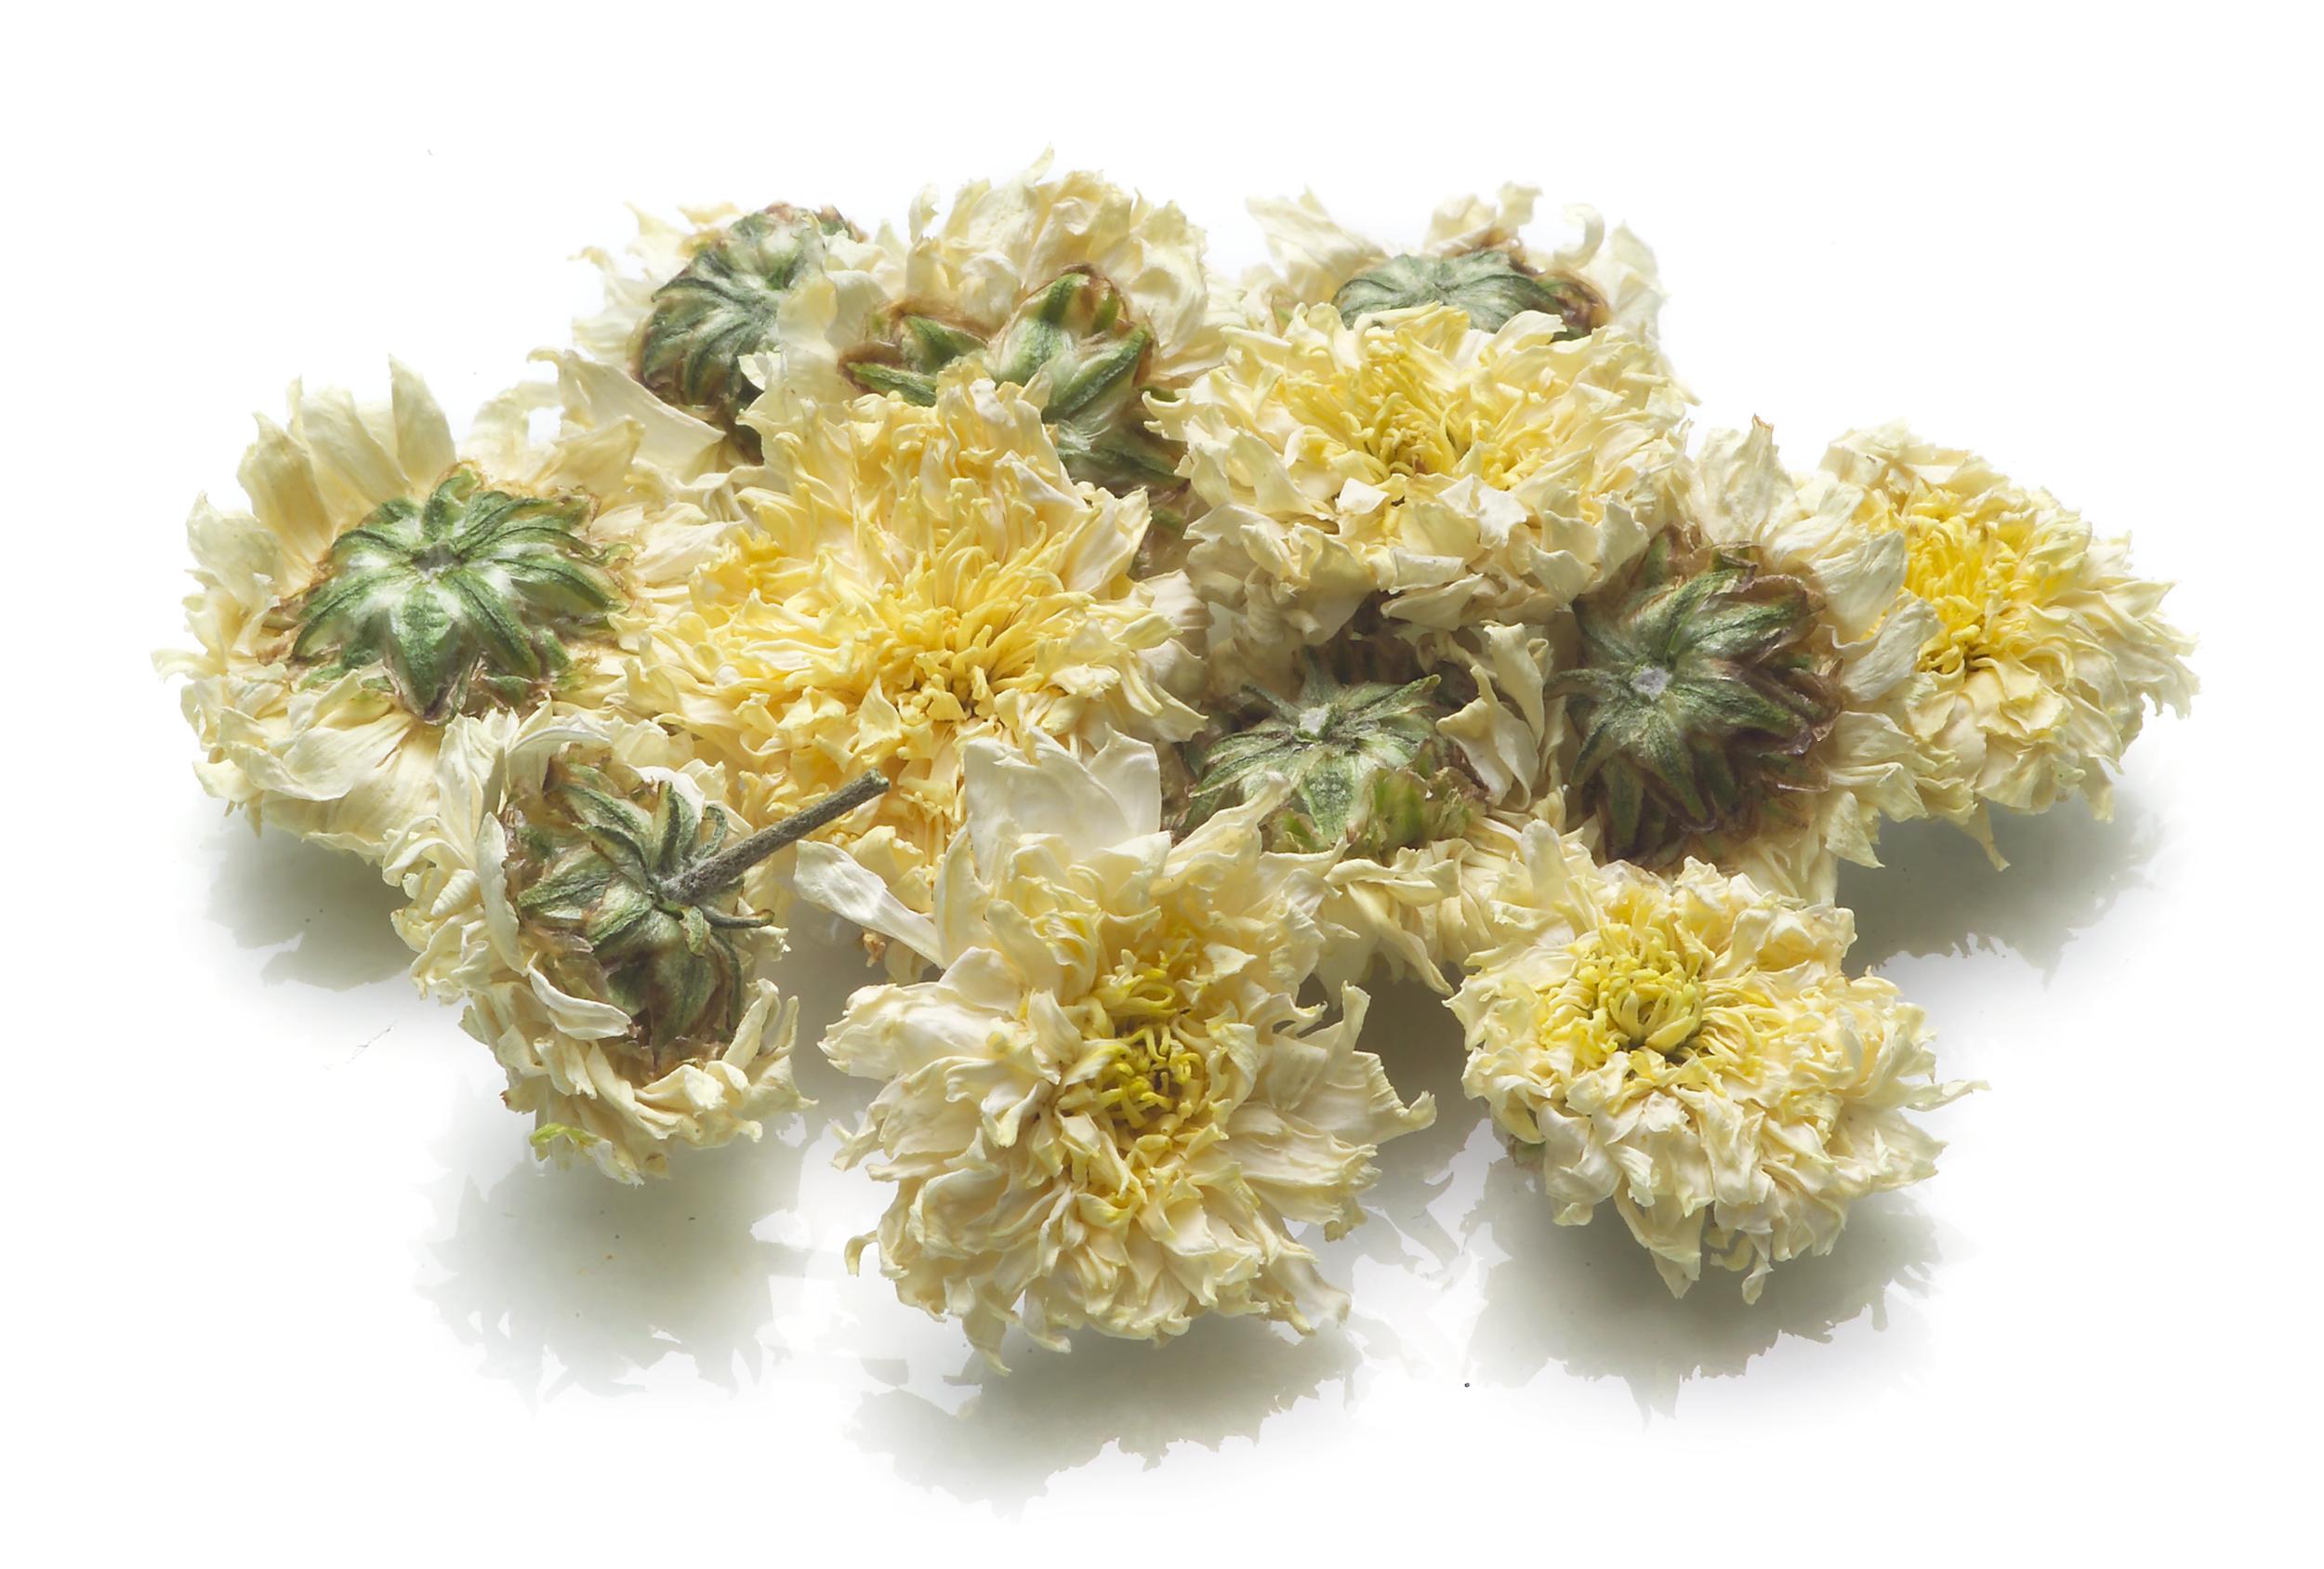 Chrysanthemum-Flower Image.png